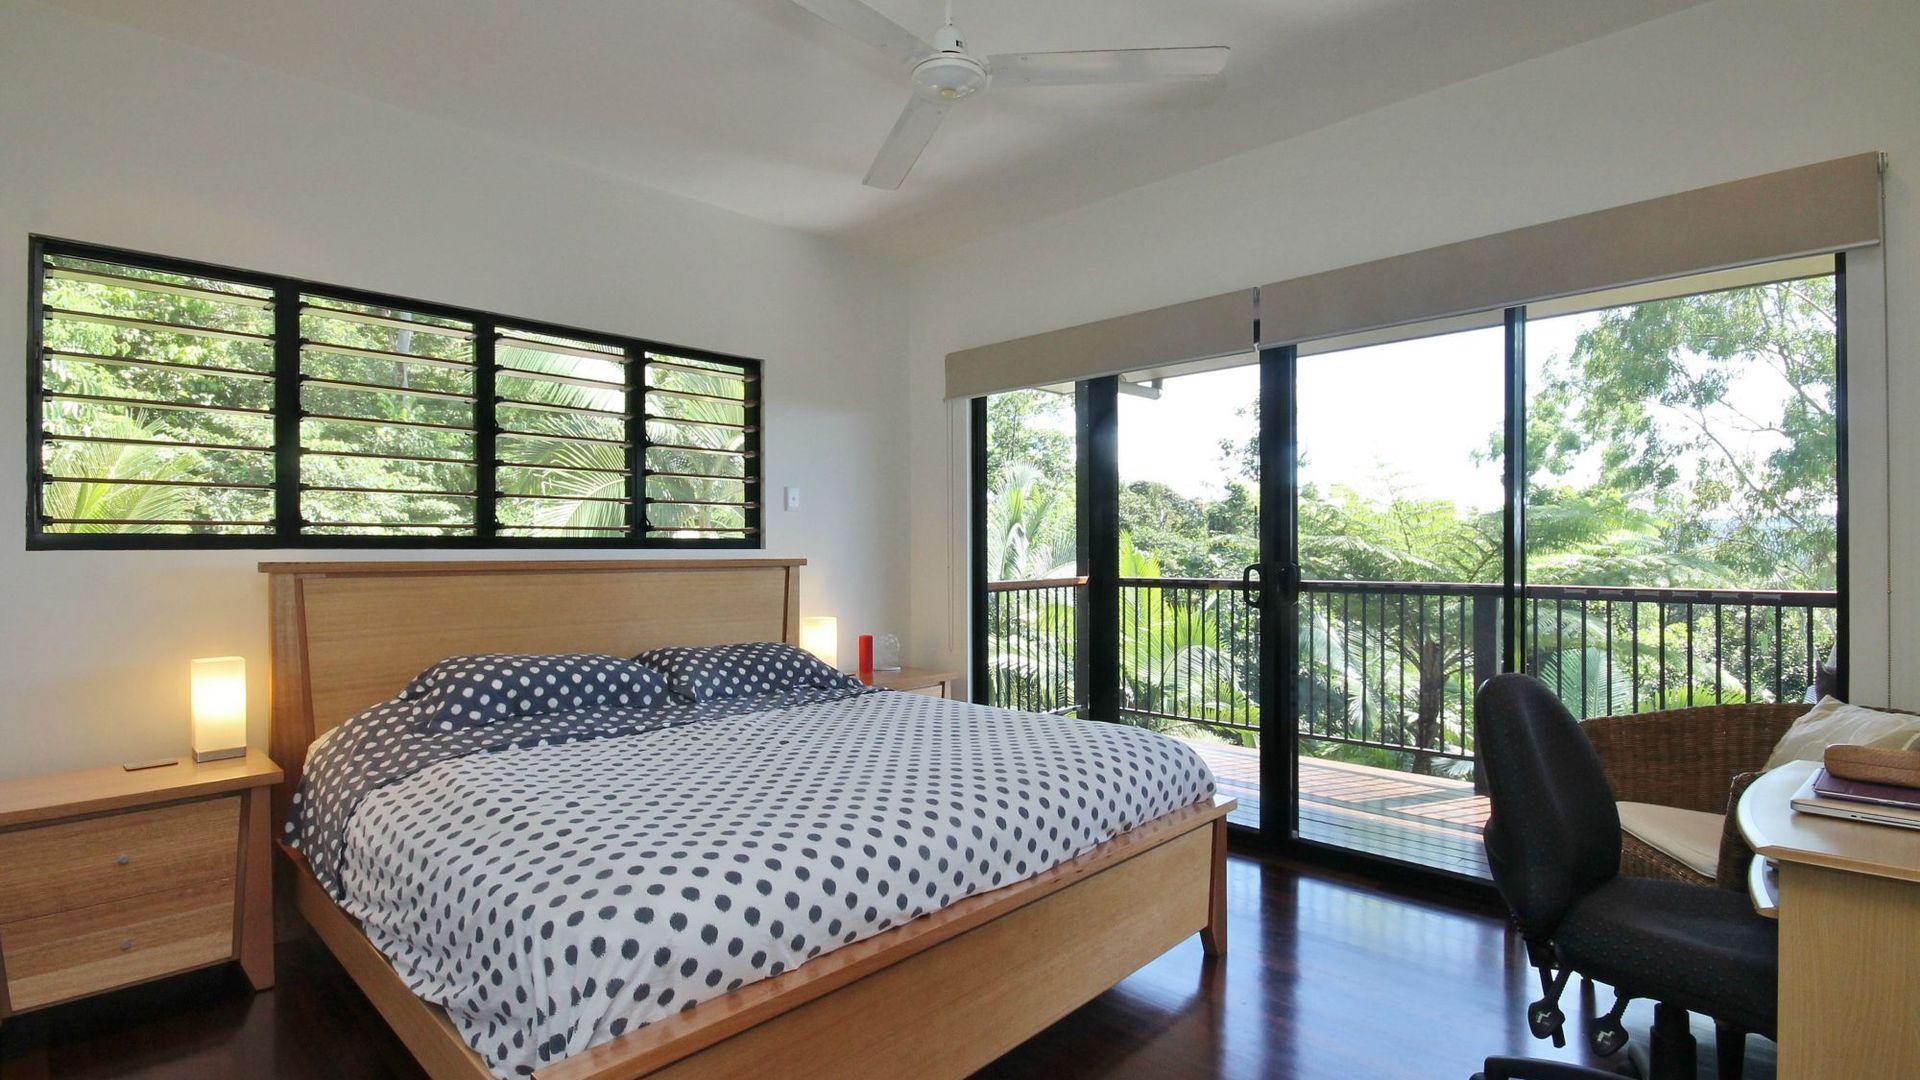 19-25 Coral Sea Drive, Mossman QLD 4873, Image 1